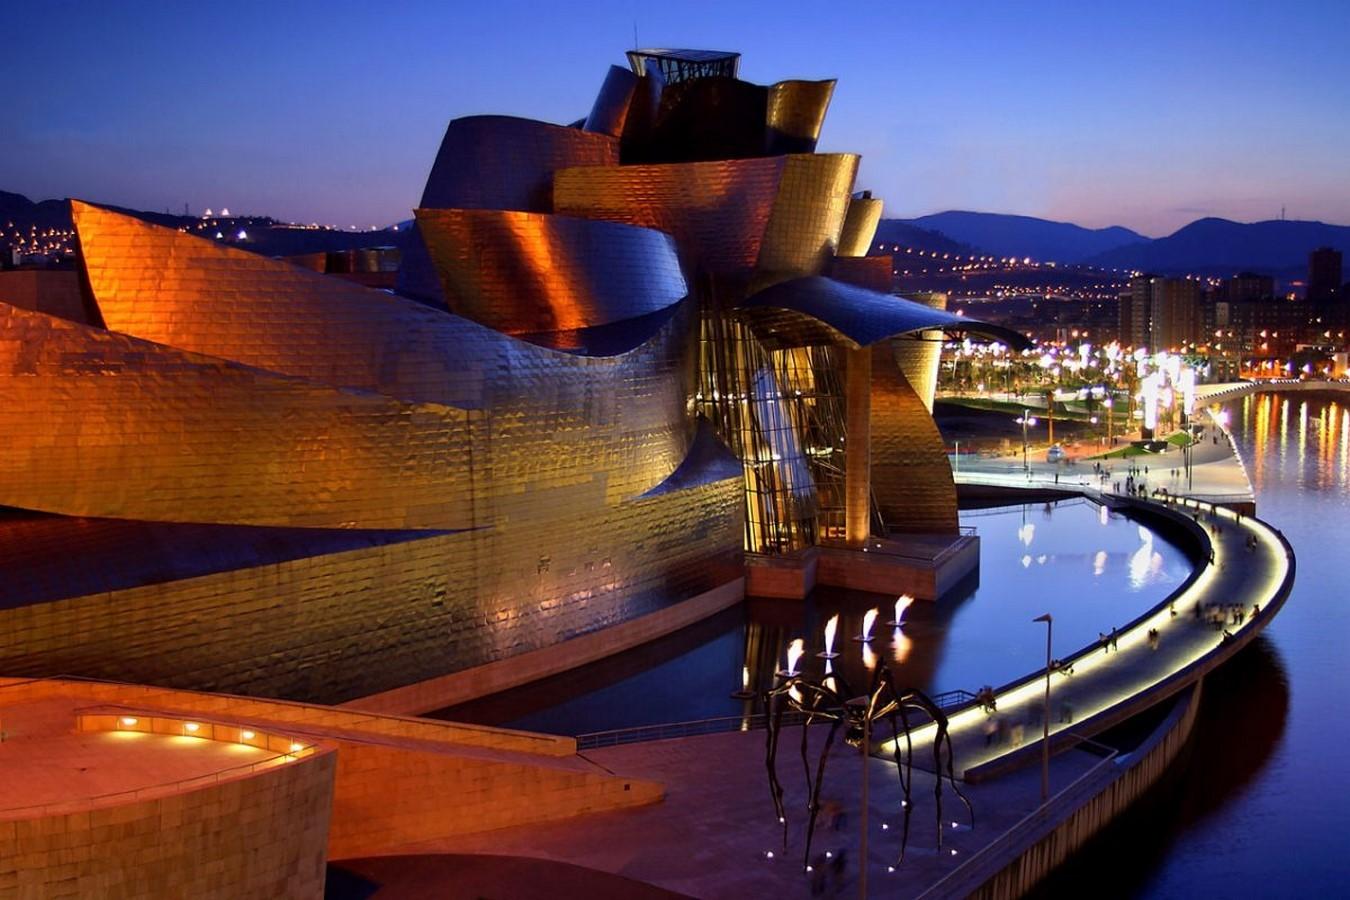 Guggenheim Bilbao (Bilbao, Spain) - Sheet2